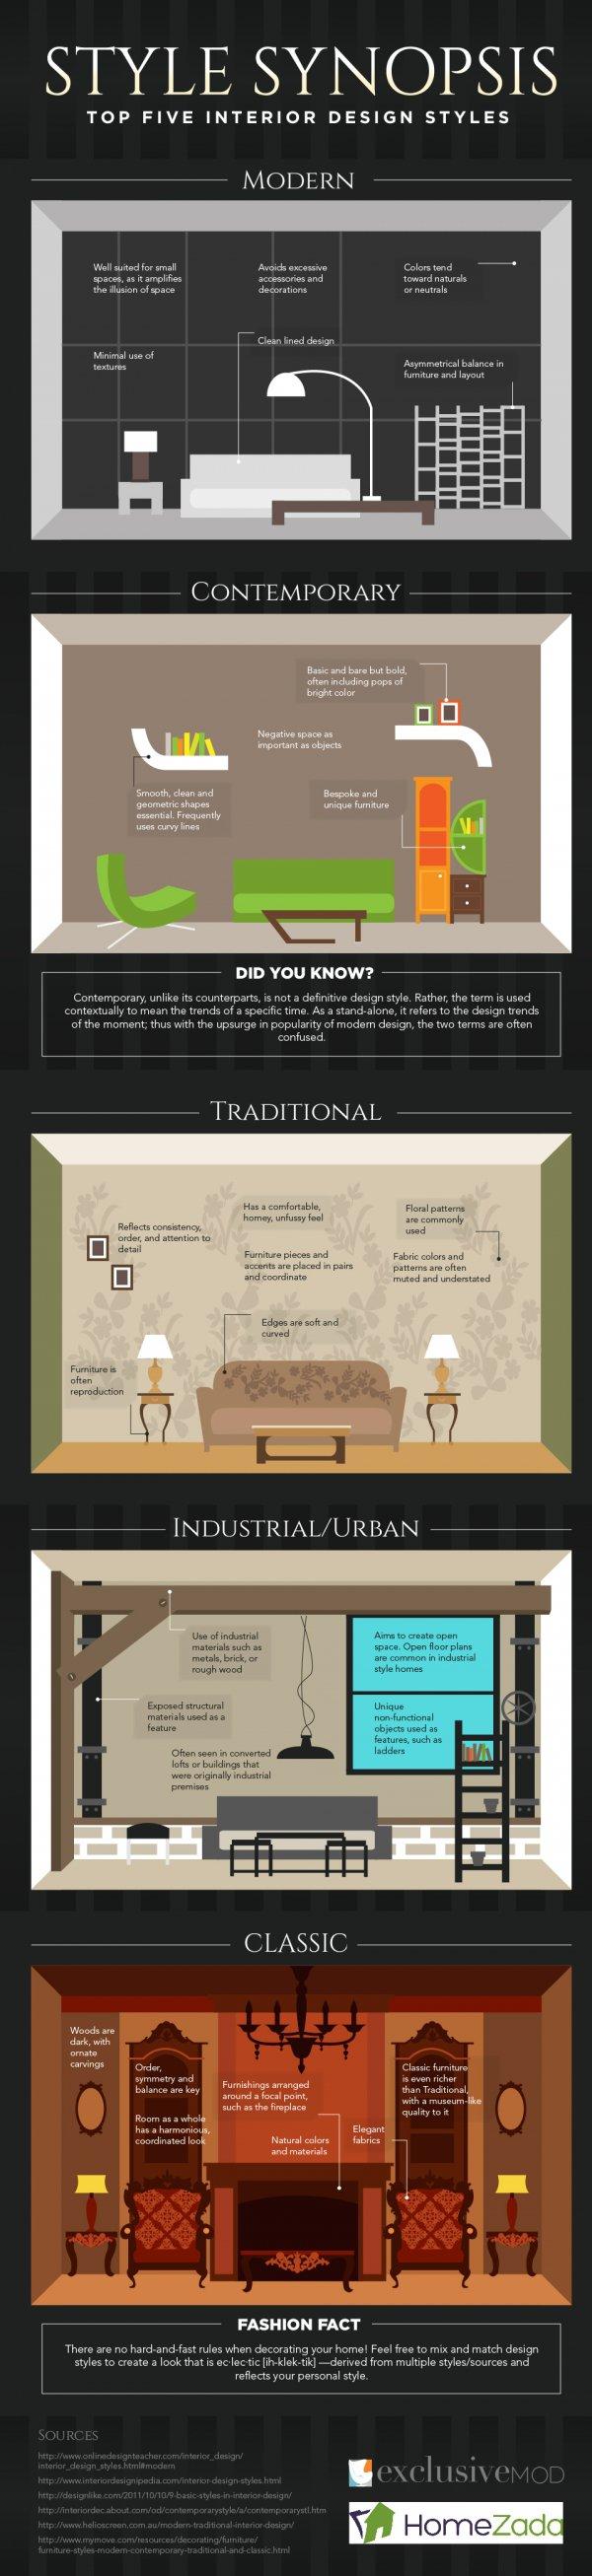 Top Five Interior Design Styles